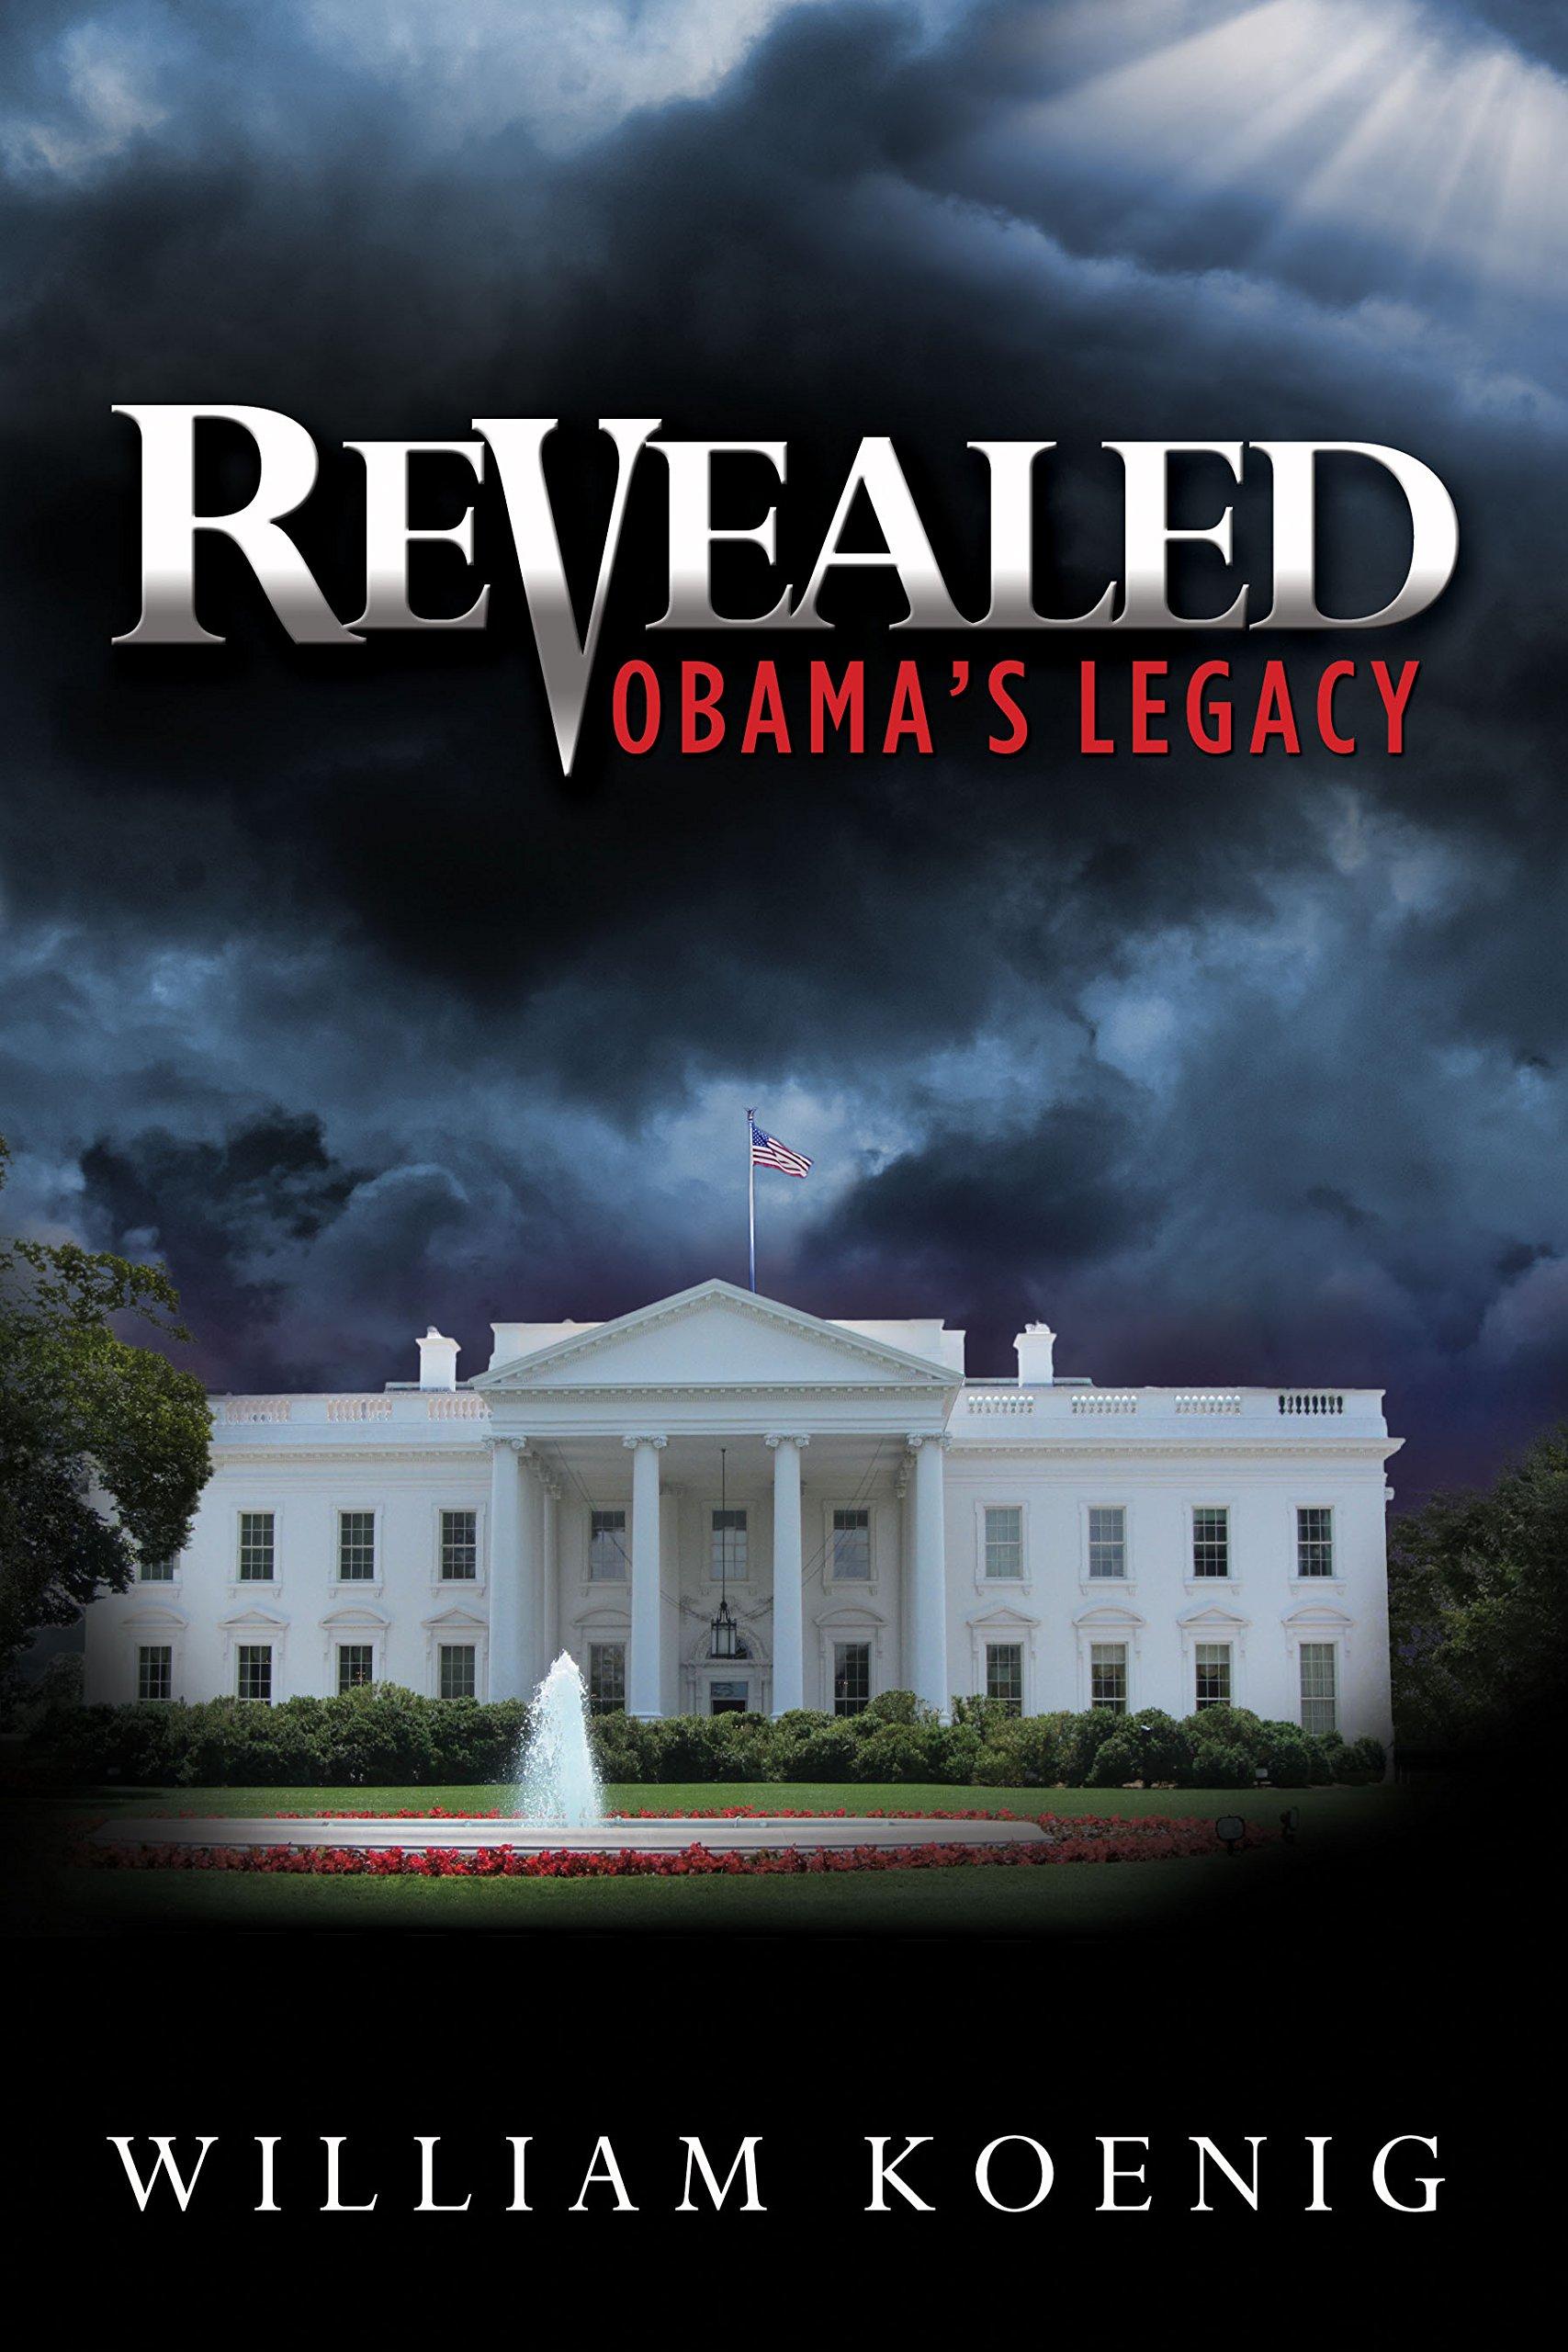 Revealed - Obama's Legacy: William Koenig: 9780971734777: Amazon.com: Books